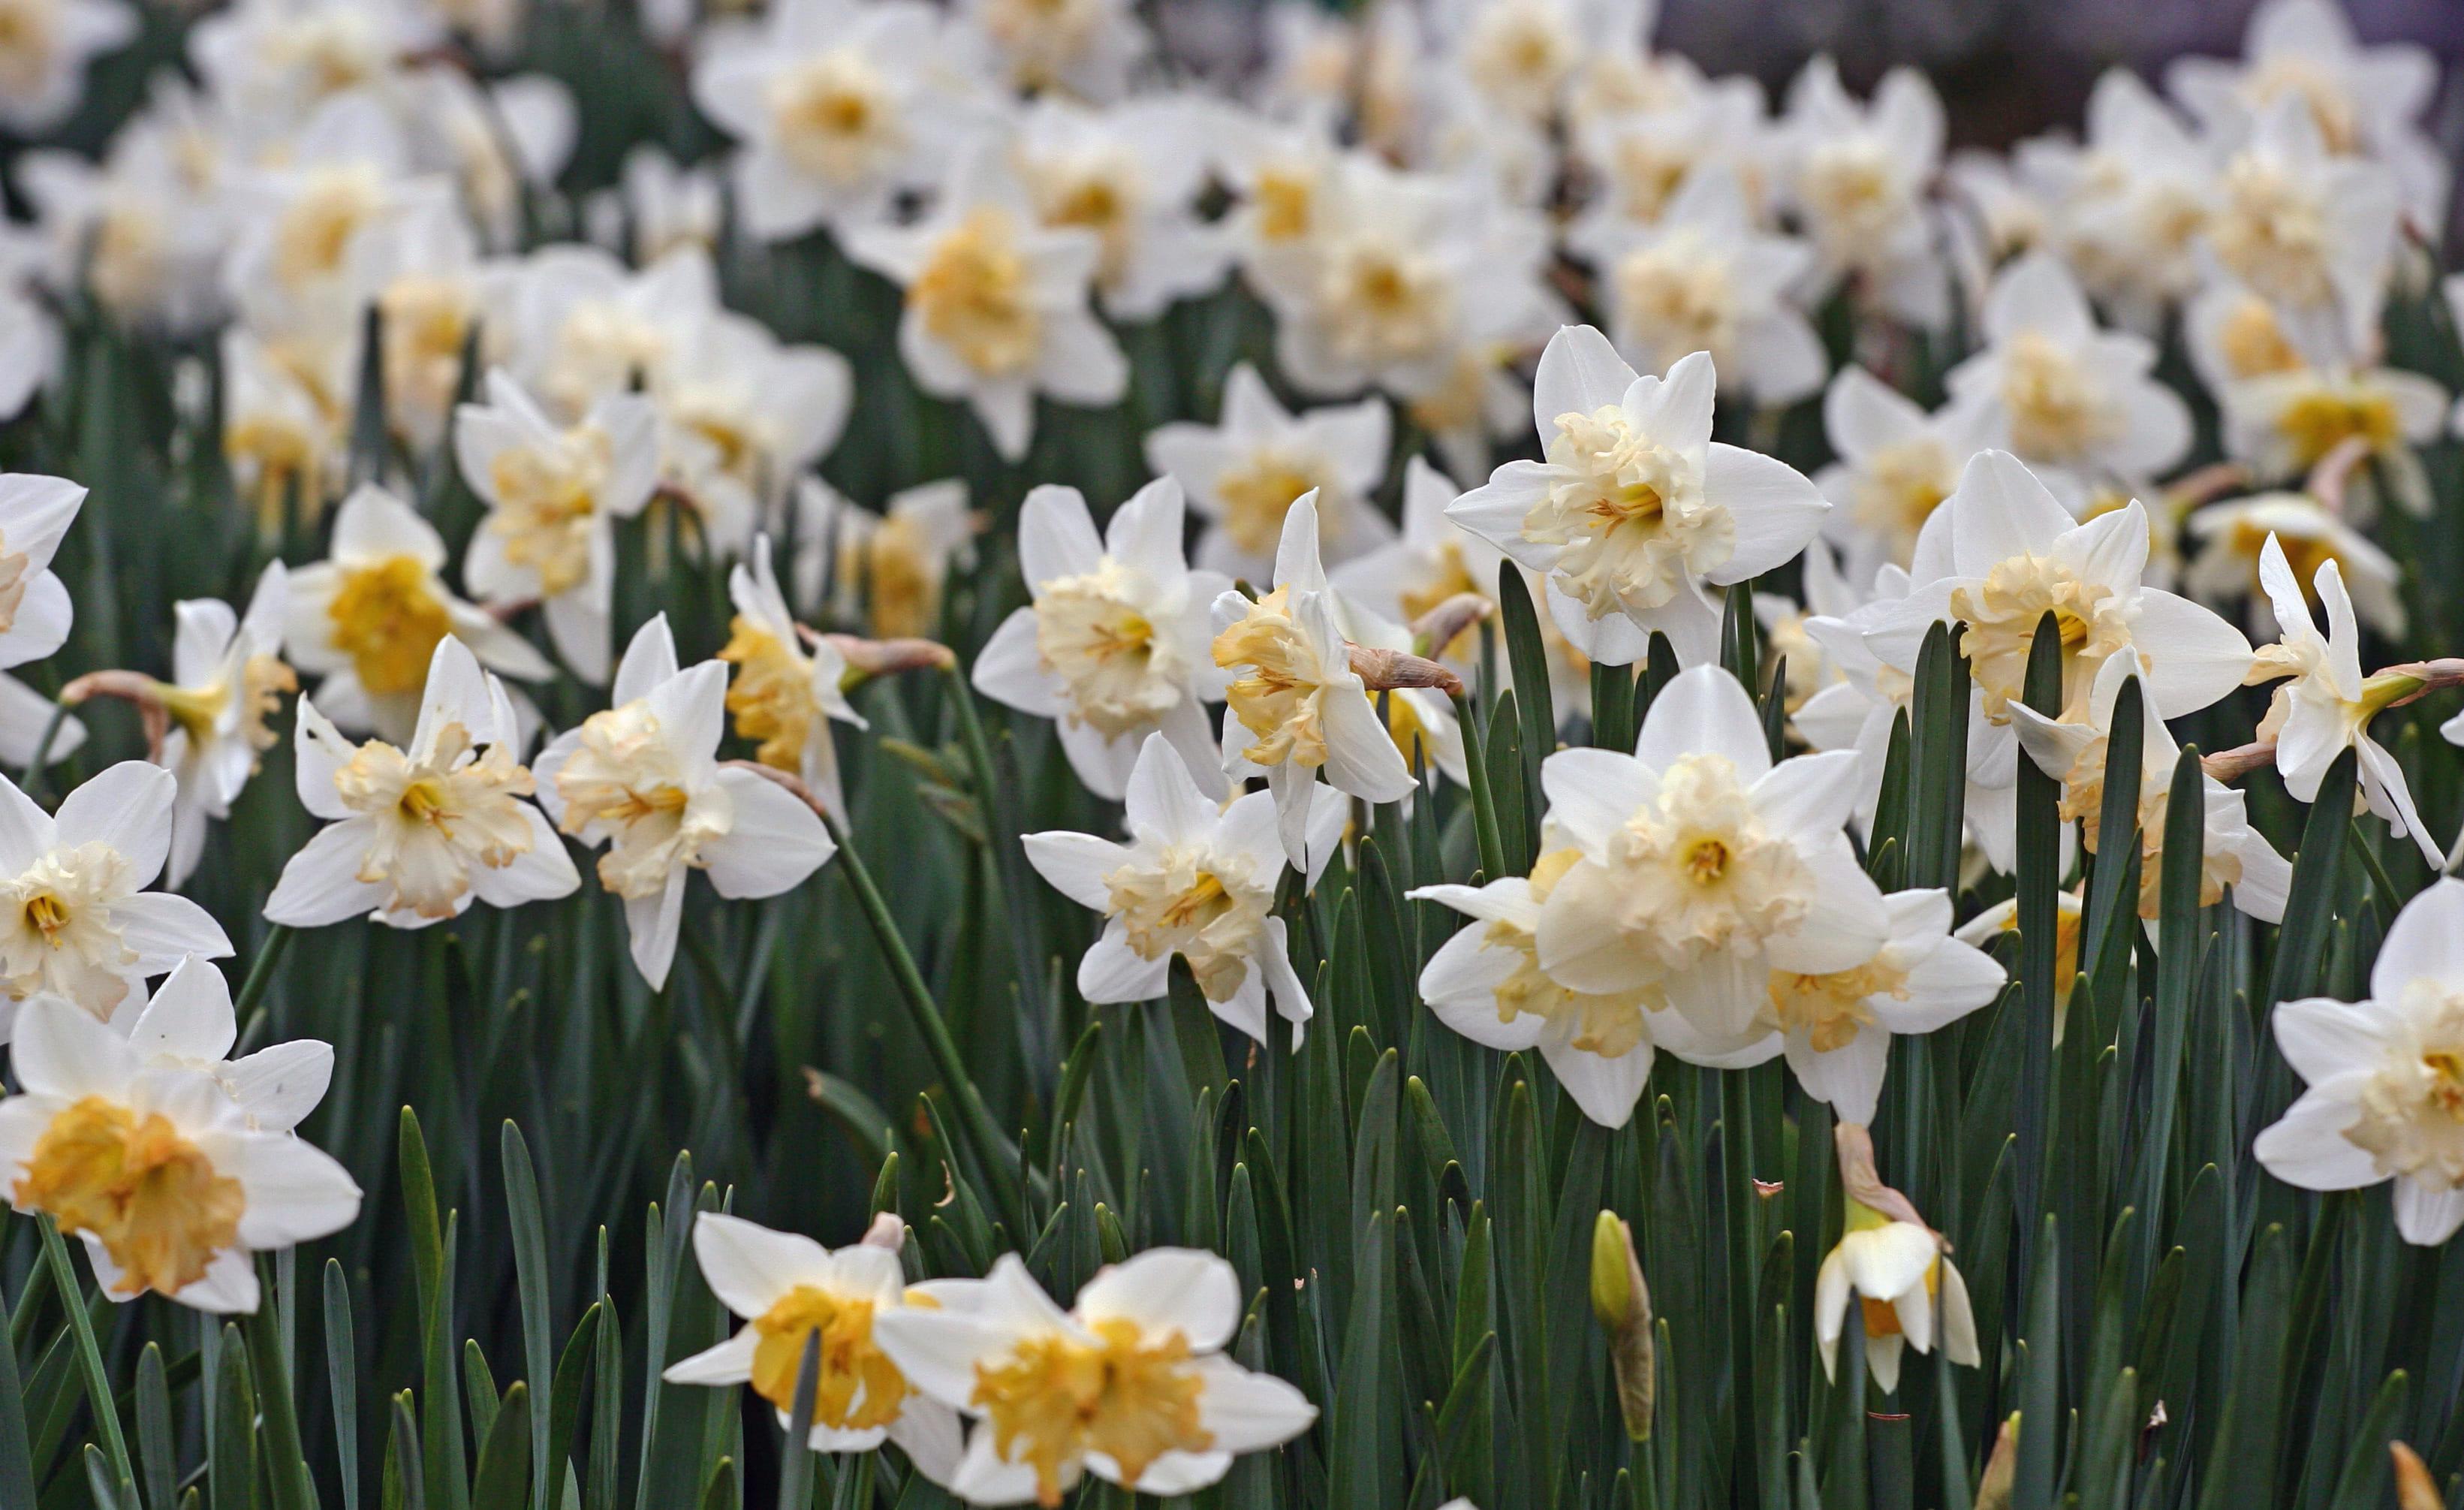 daffodils-photo-58